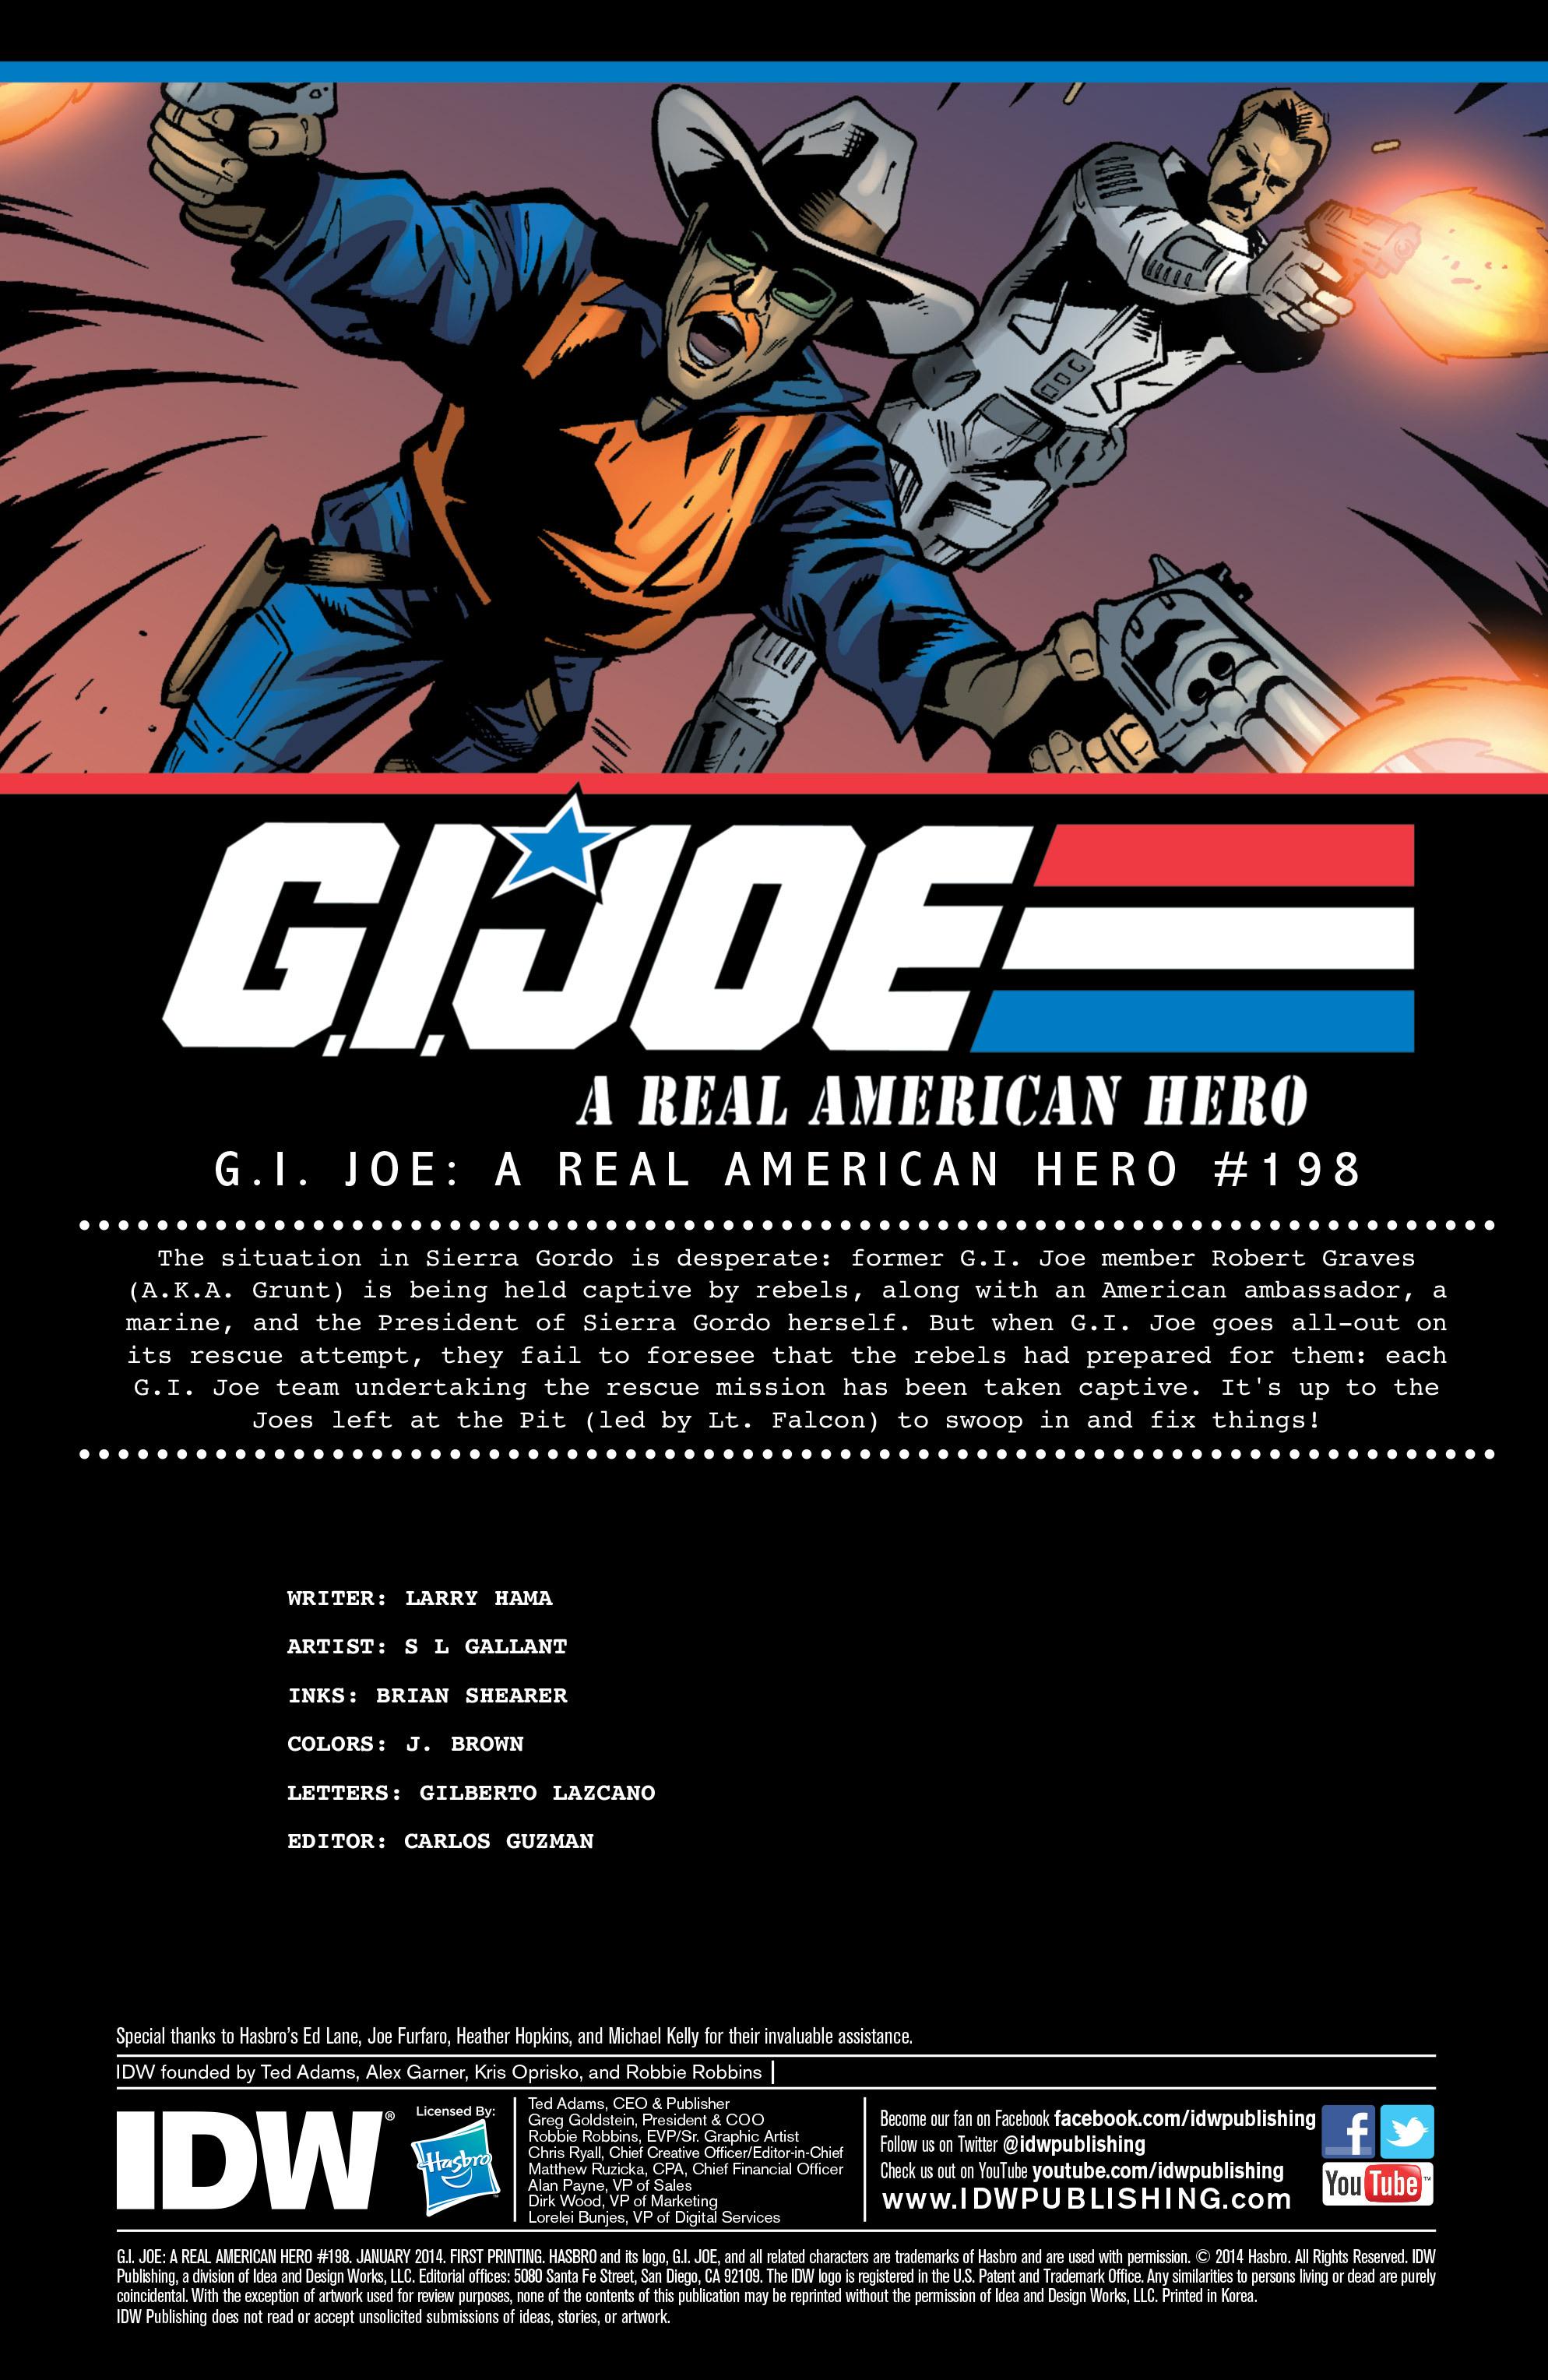 G.I. Joe: A Real American Hero 198 Page 2